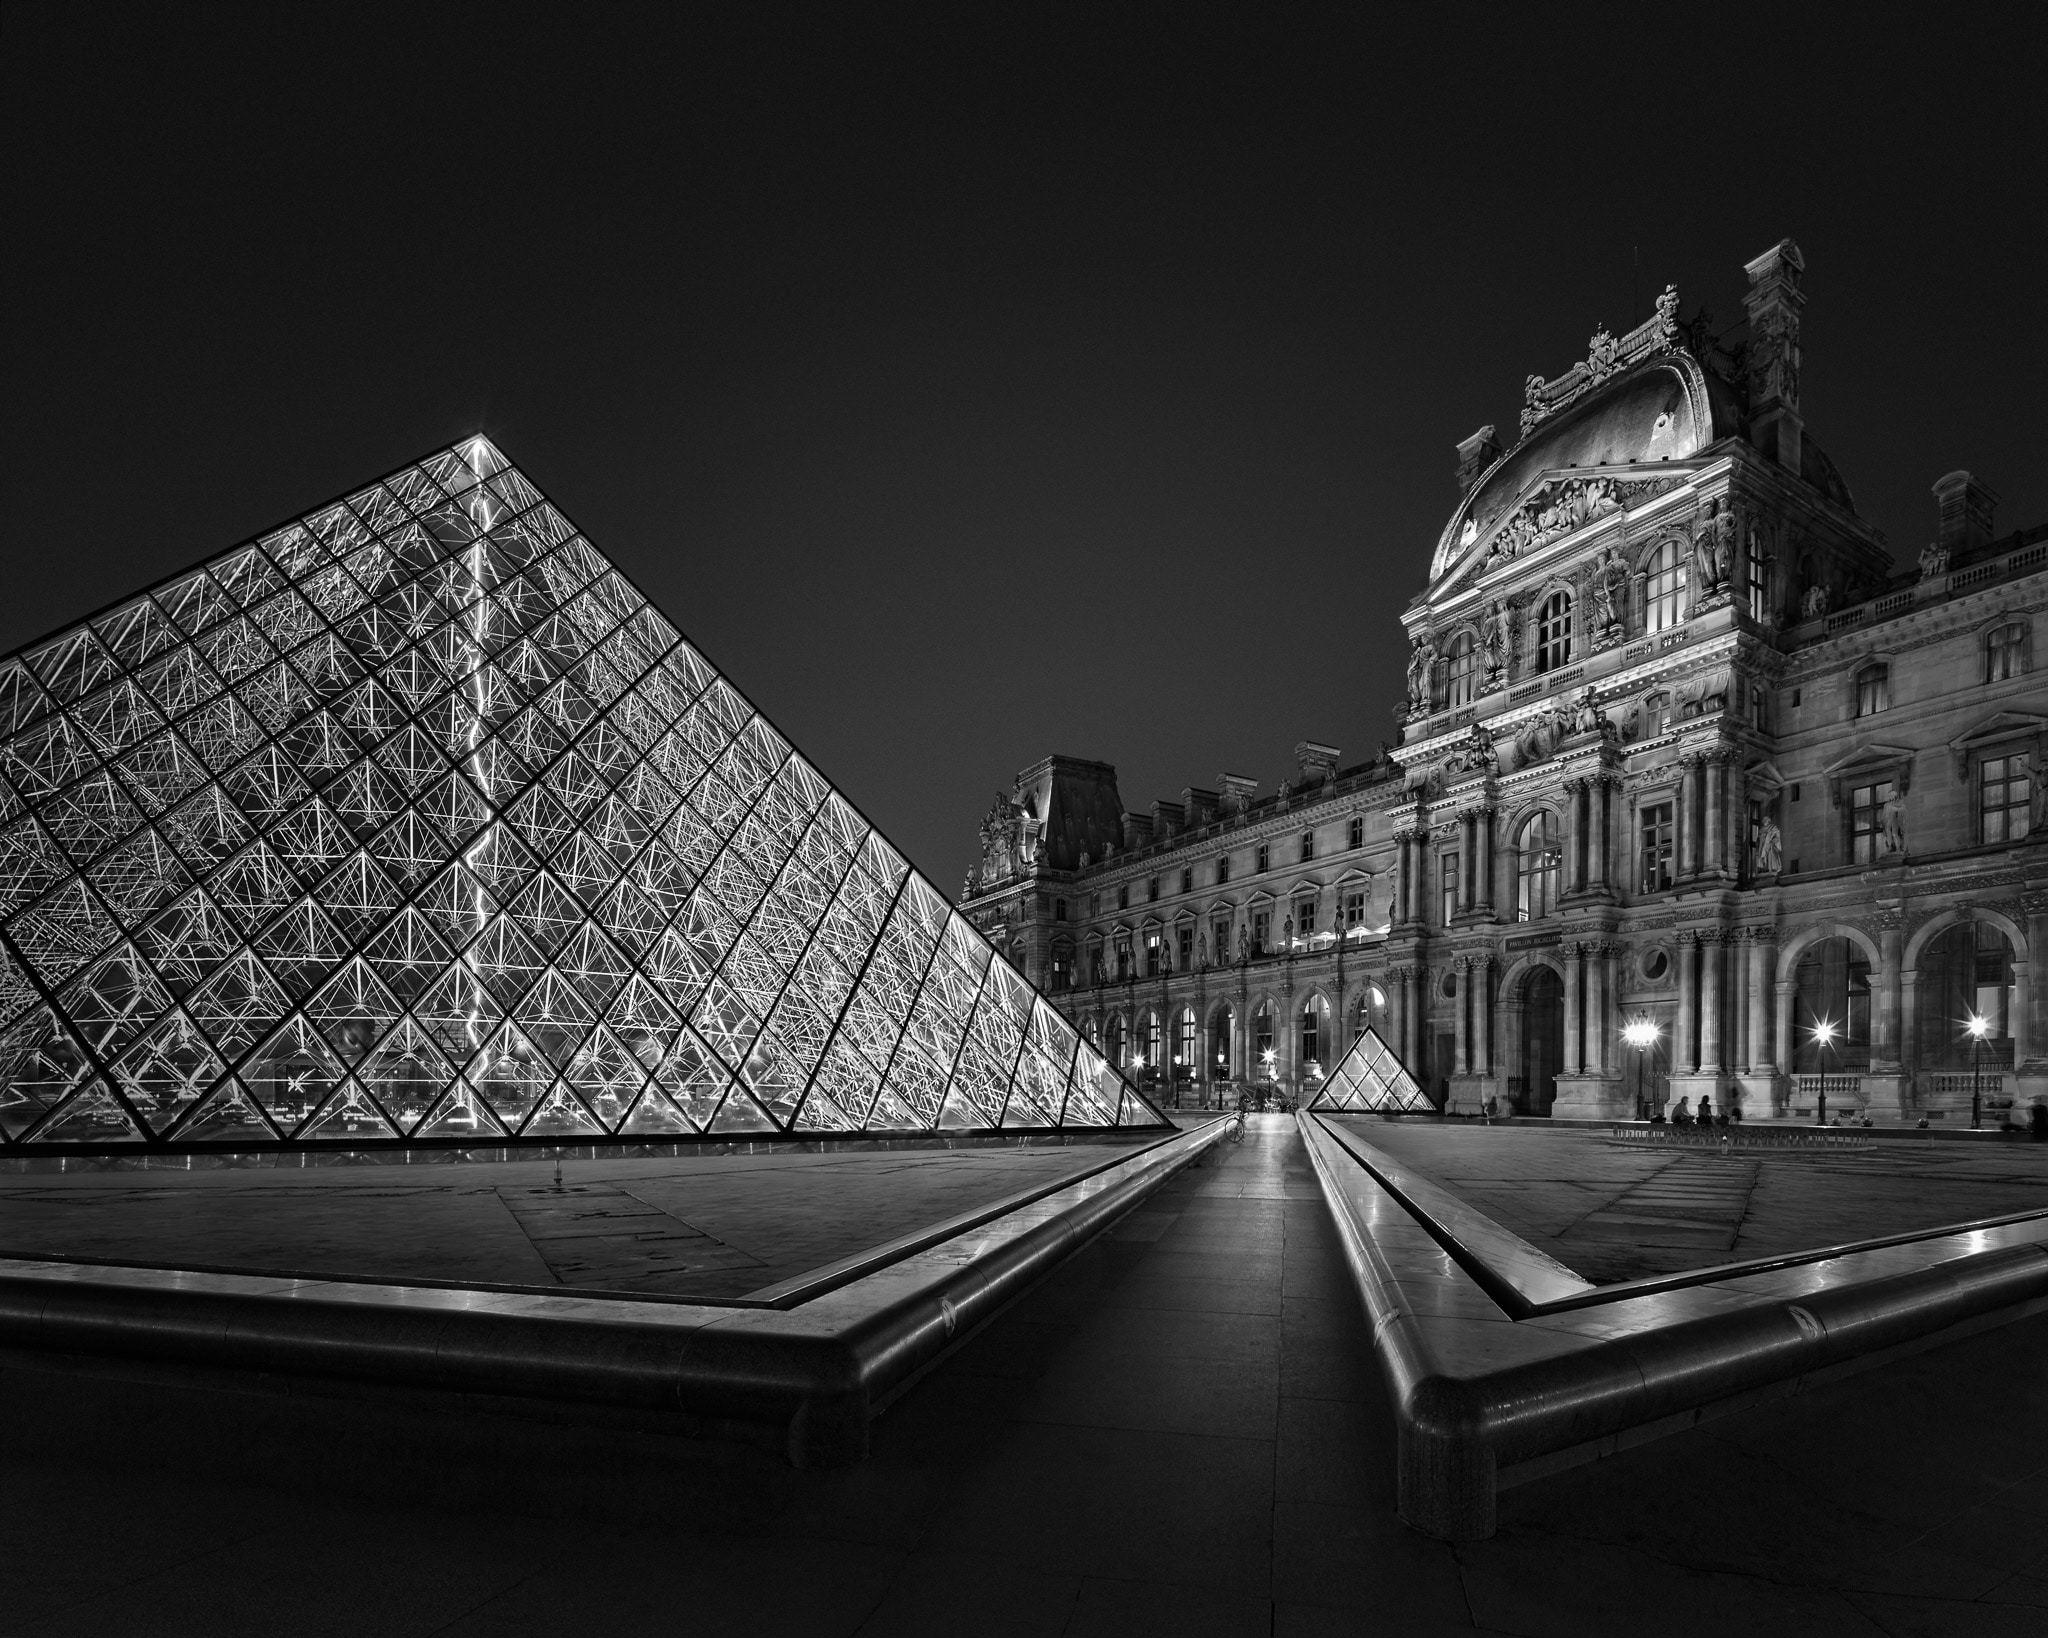 Untitled - Louvre Museum © Julia Anna Gospodarou